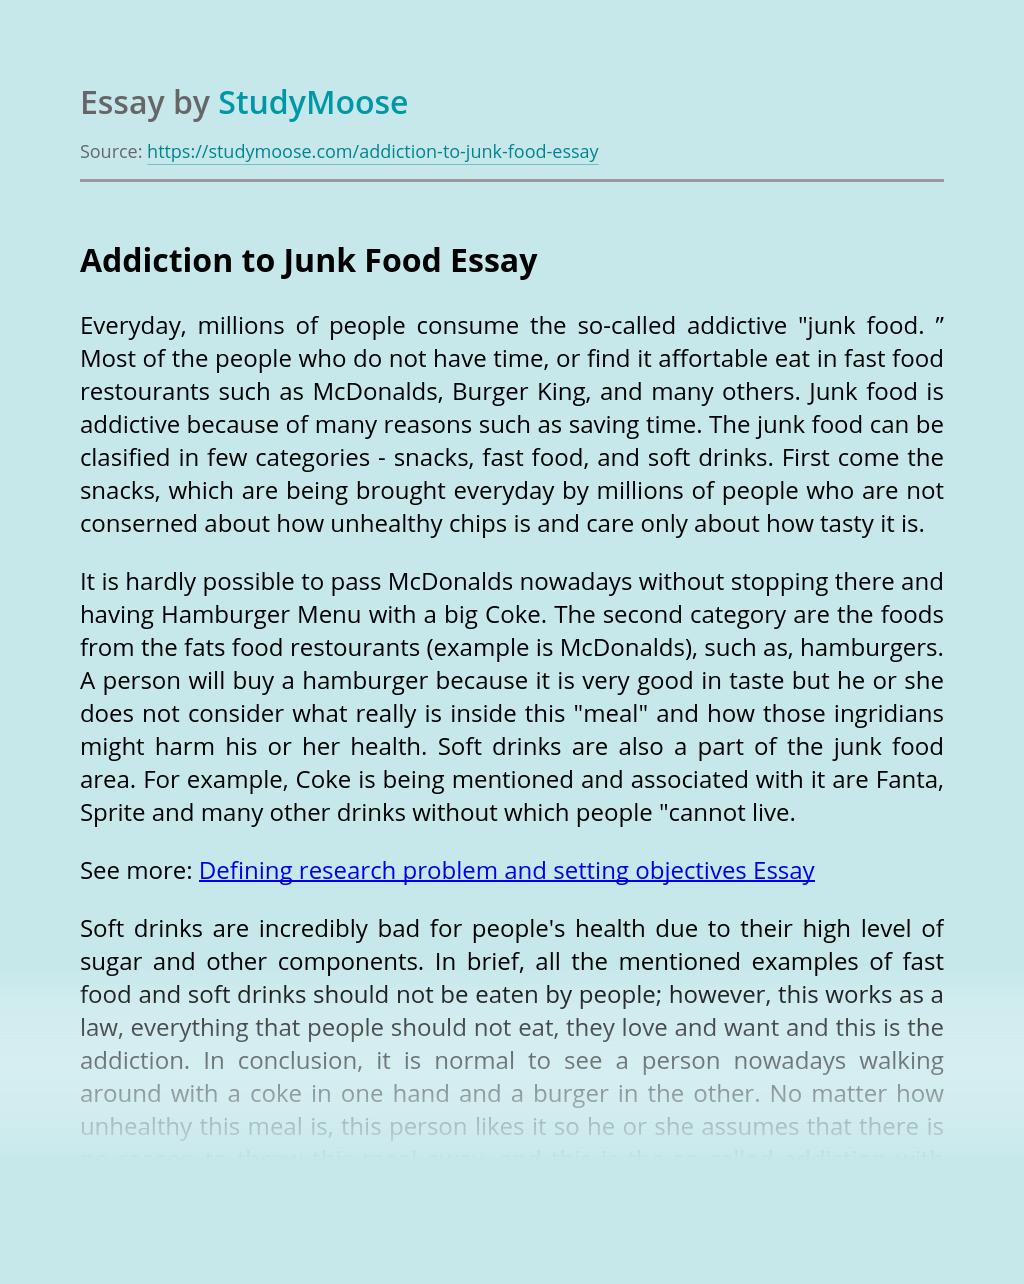 Addiction to Junk Food